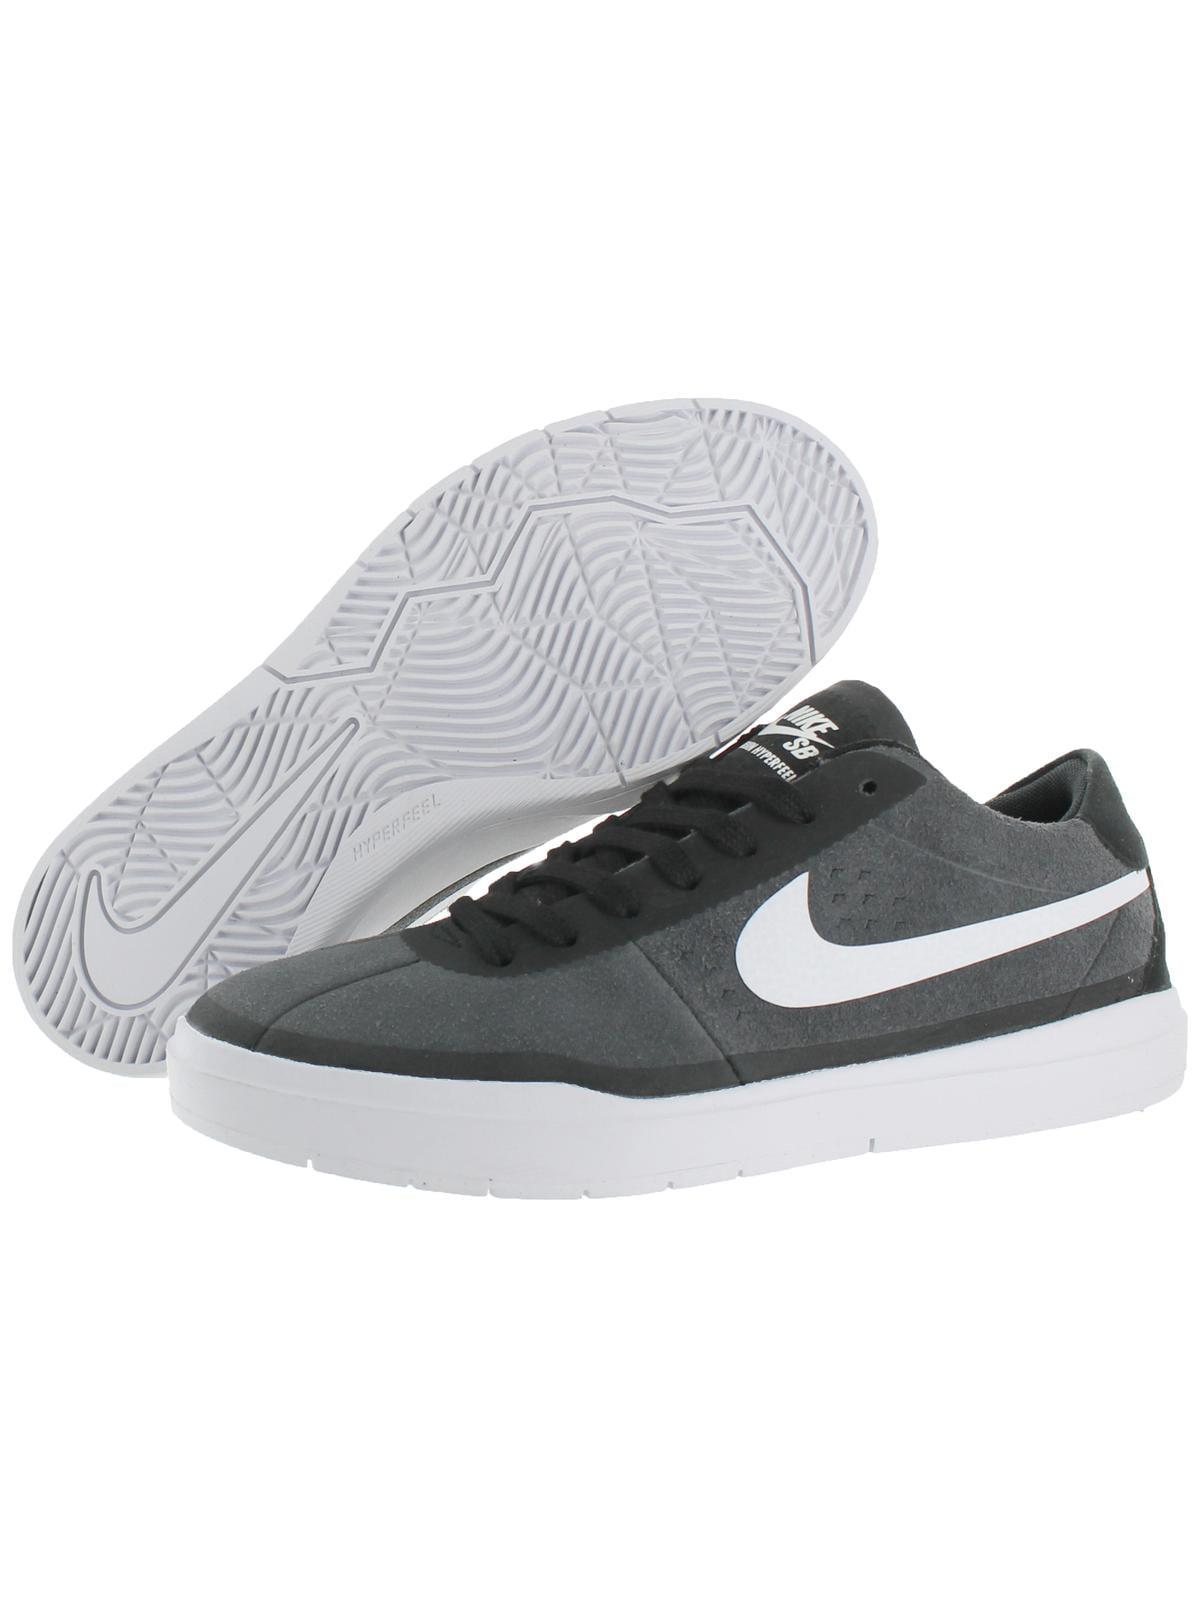 Nike Mens Bruin SB Hyperfeel Low-Top Athletic Skateboarding Shoes